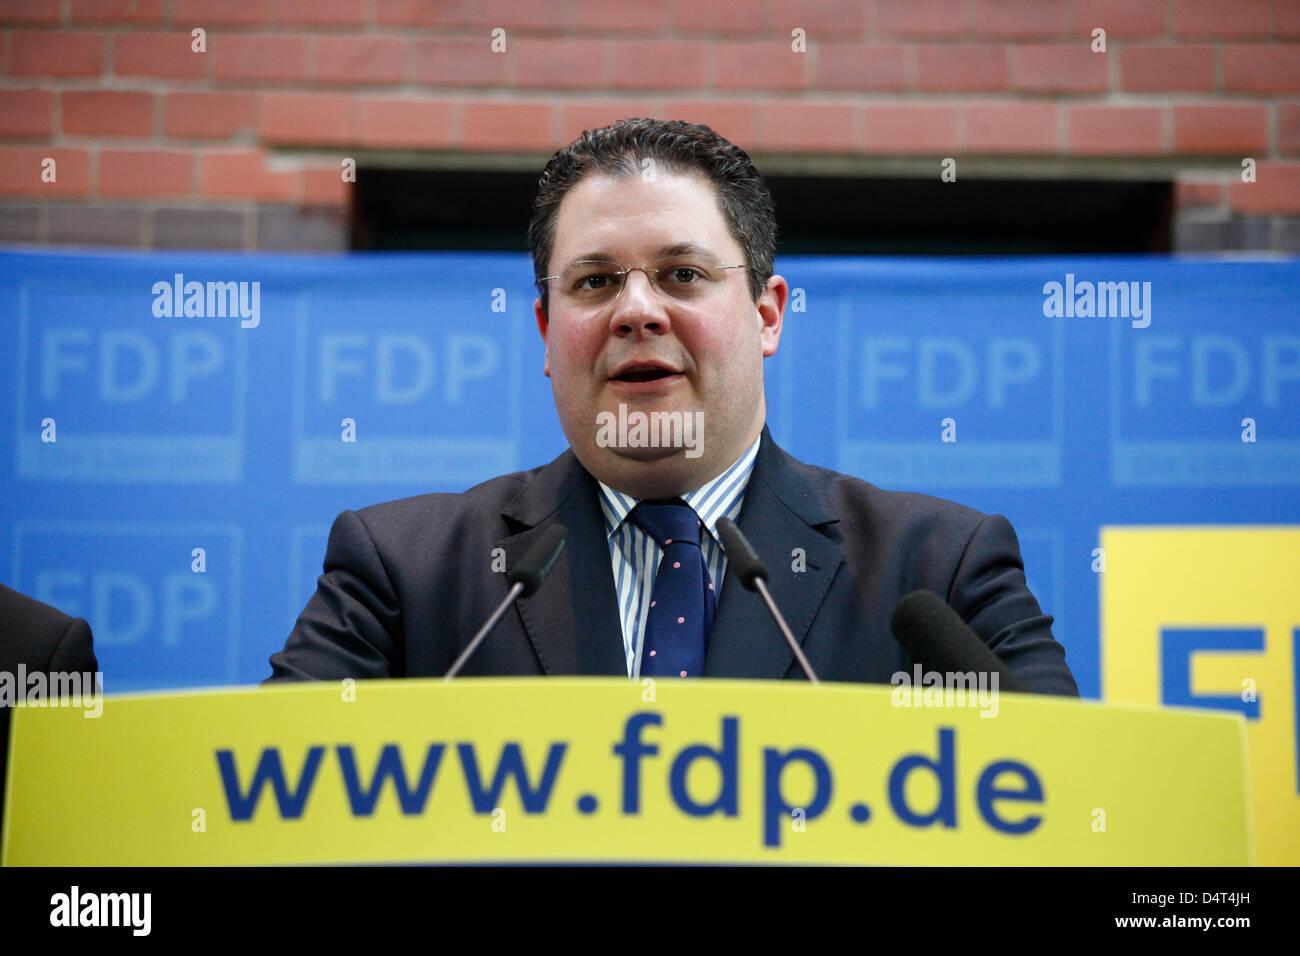 FDP-General secretary Patrick Döring  during a press conference.Berlin, 18. Maerz 2013. Pressekonferenz der FDP Stock Photo